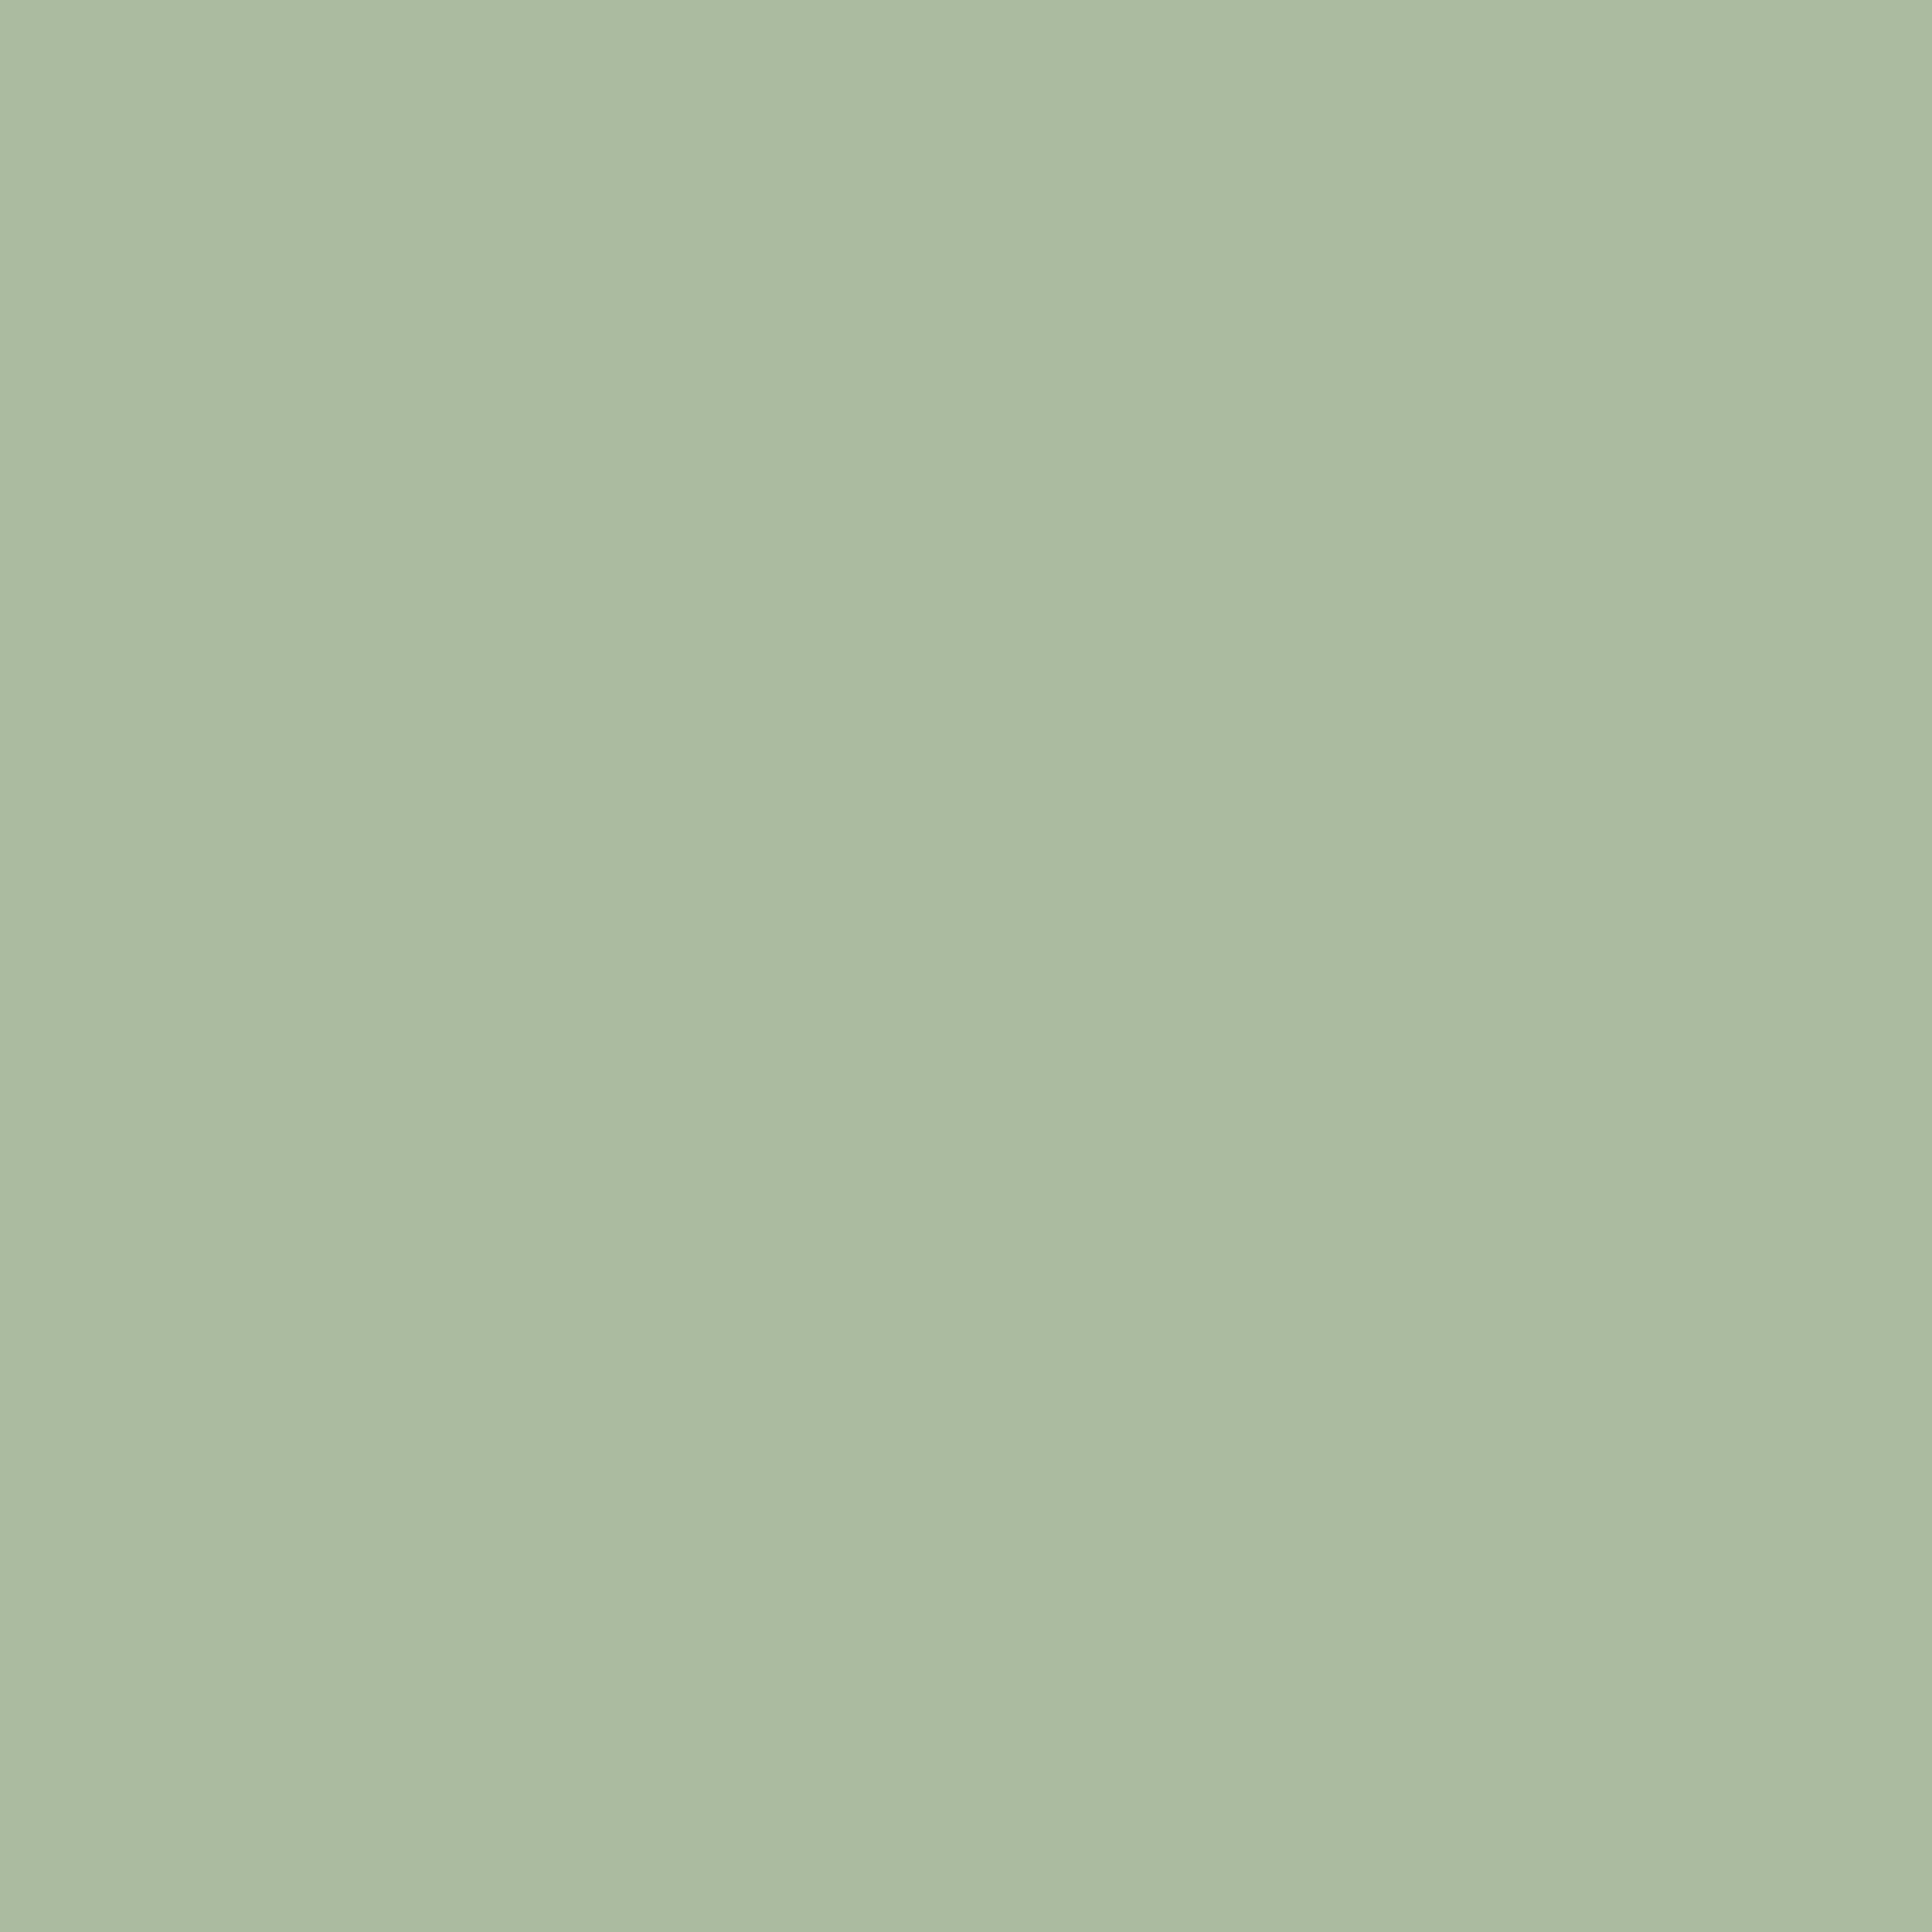 2732x2732 Laurel Green Solid Color Background